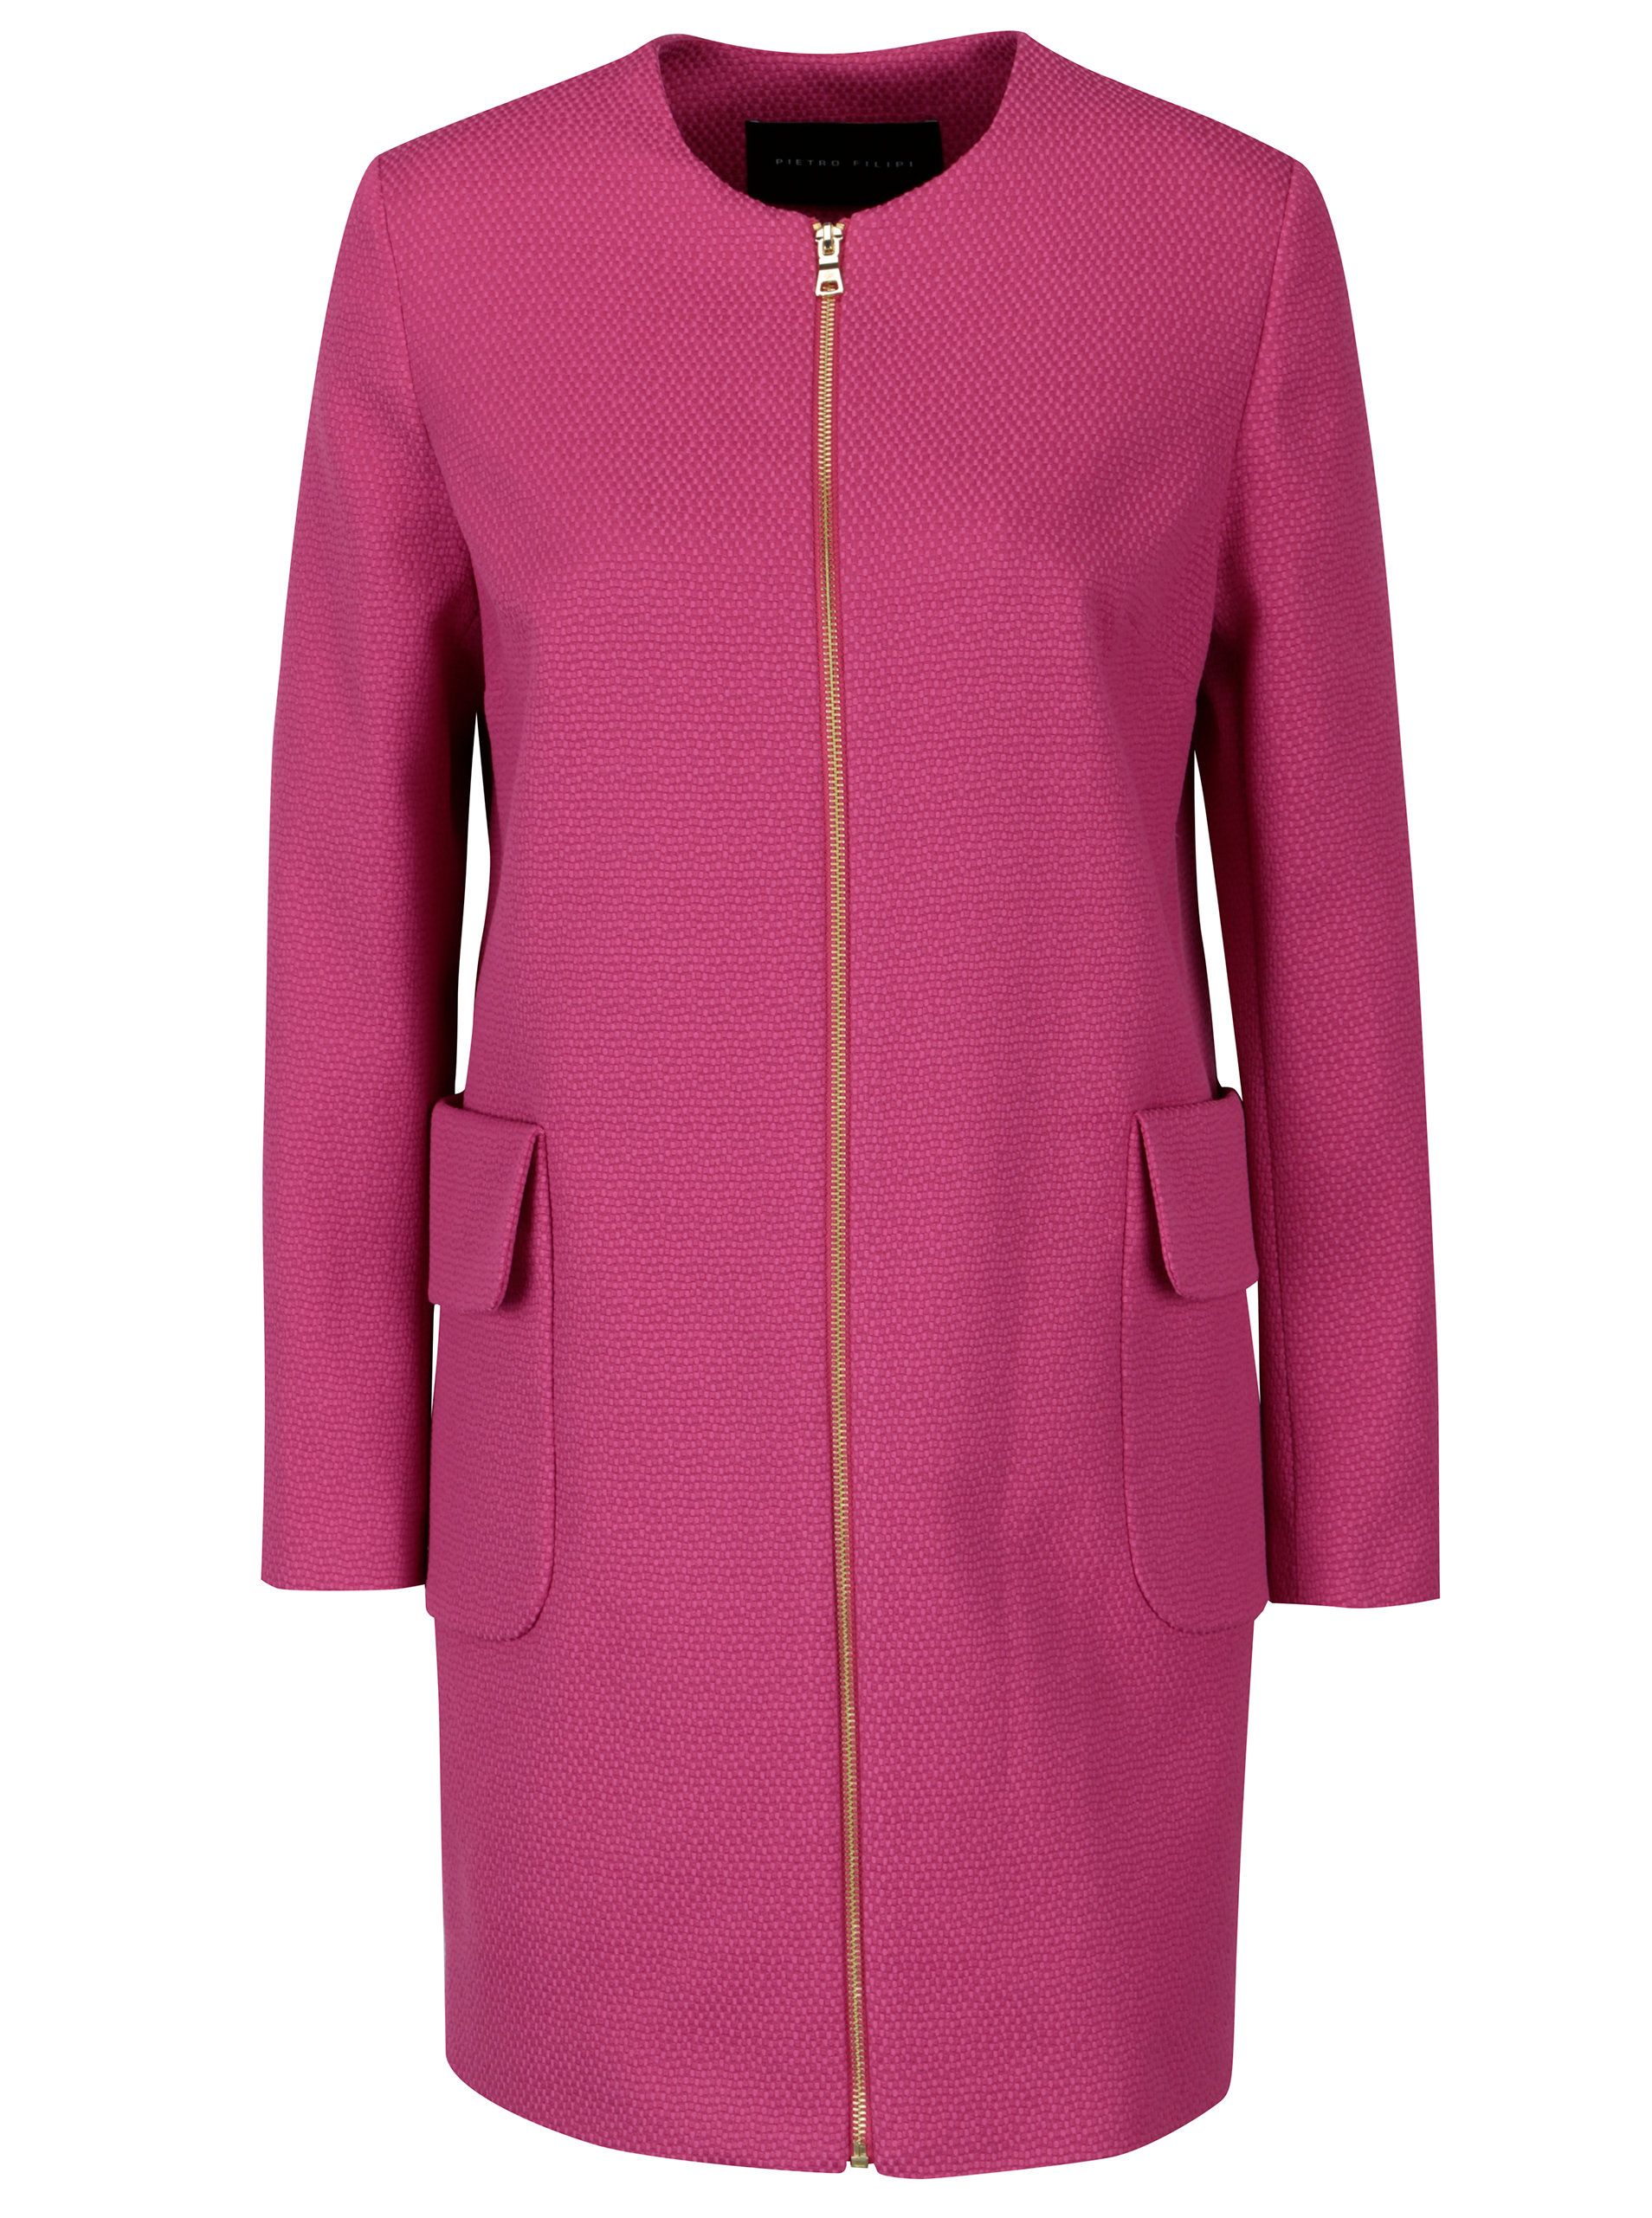 Růžový dámský kabát Pietro Filipi ... d541b49c97